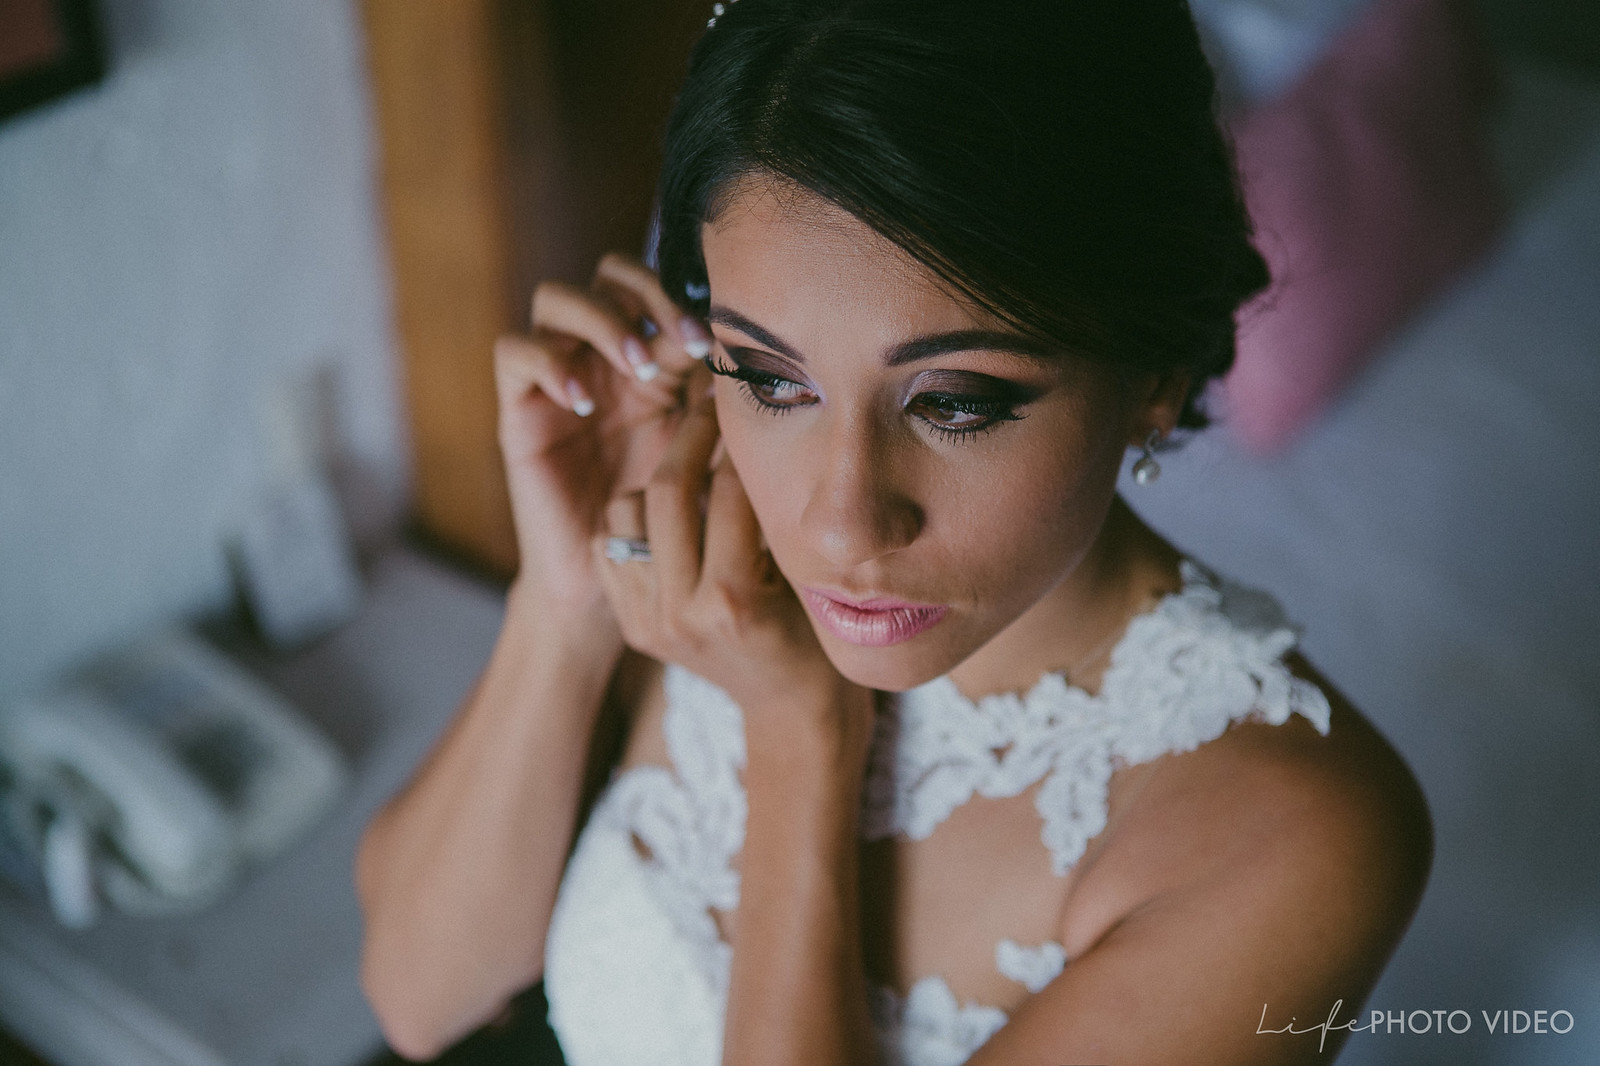 LifePhotoVideo_Boda_Guanajuato_Wedding_0011